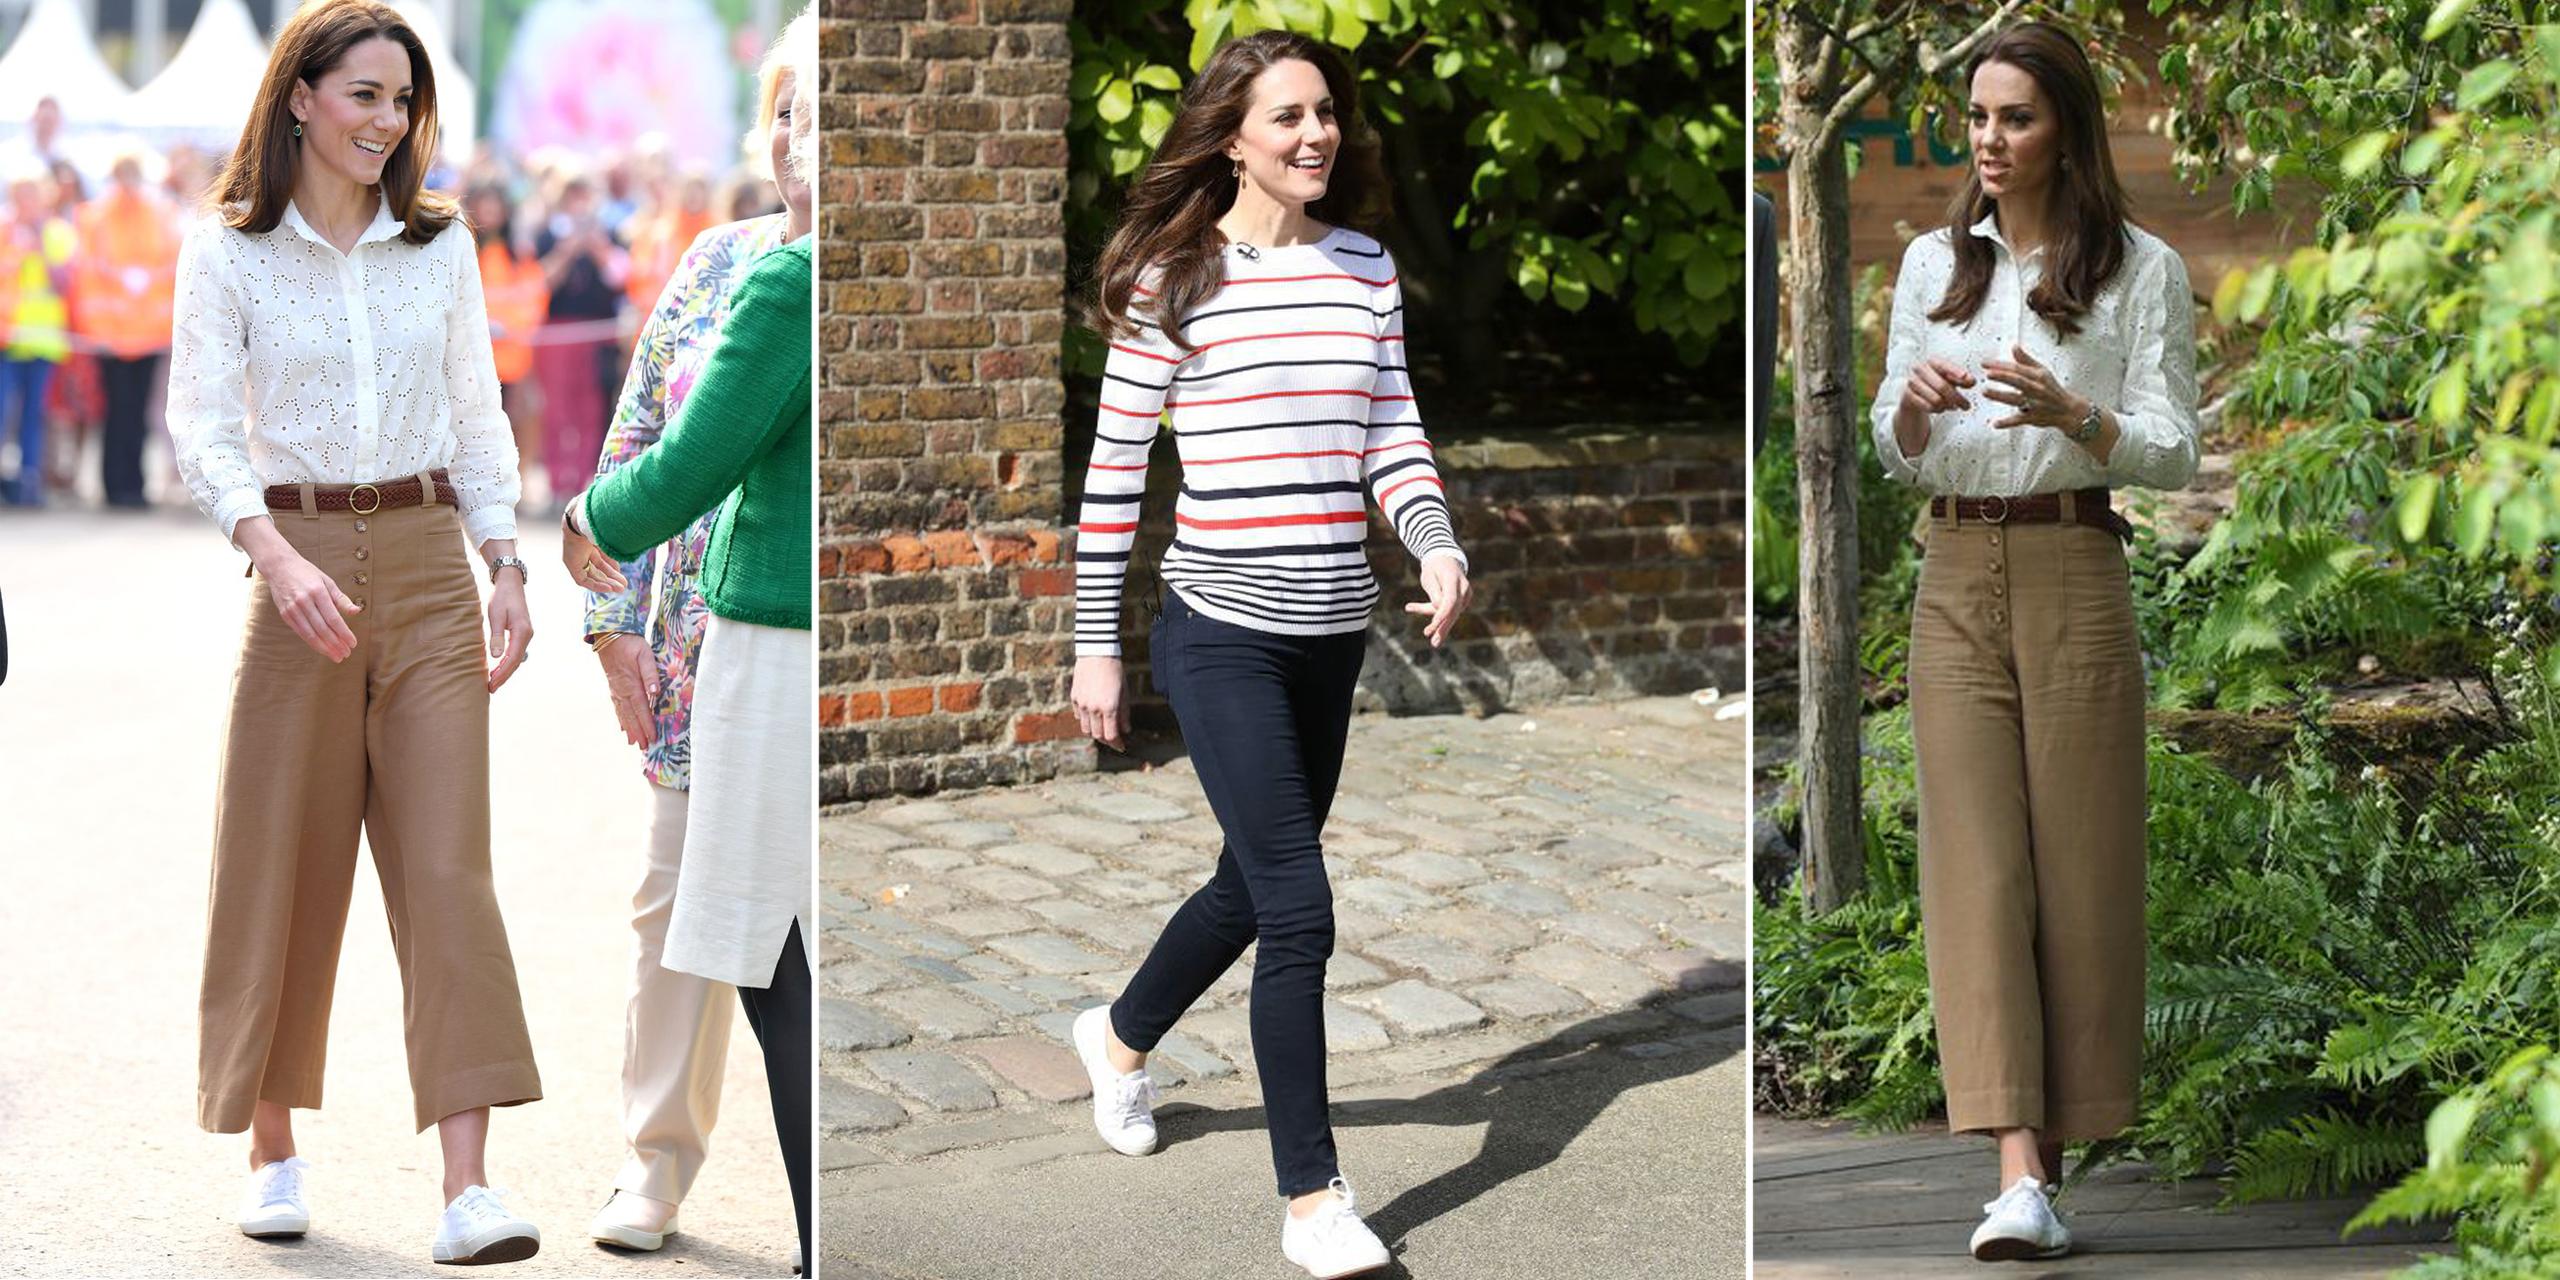 Superga Sneakers - Kate Middleton Shoes